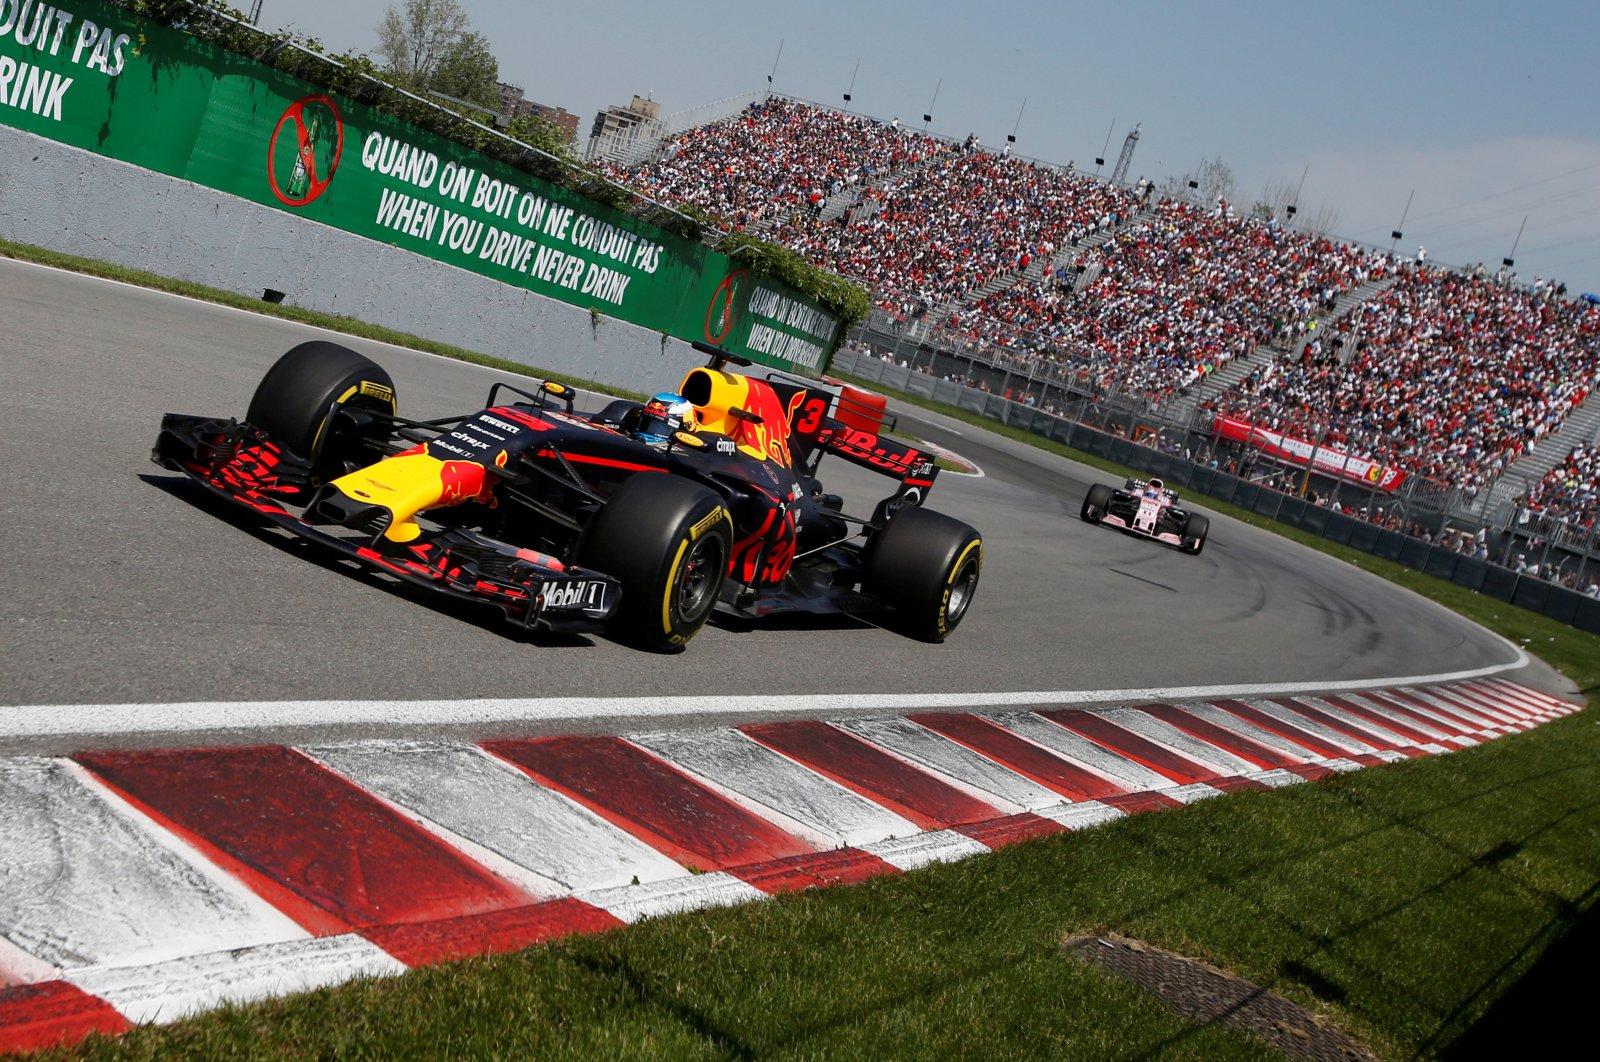 Red Bull's Daniel Ricciardo in action during Canada Grand Prix Formula One Race in Montreal, June 11, 2017. (Reuters Photo)